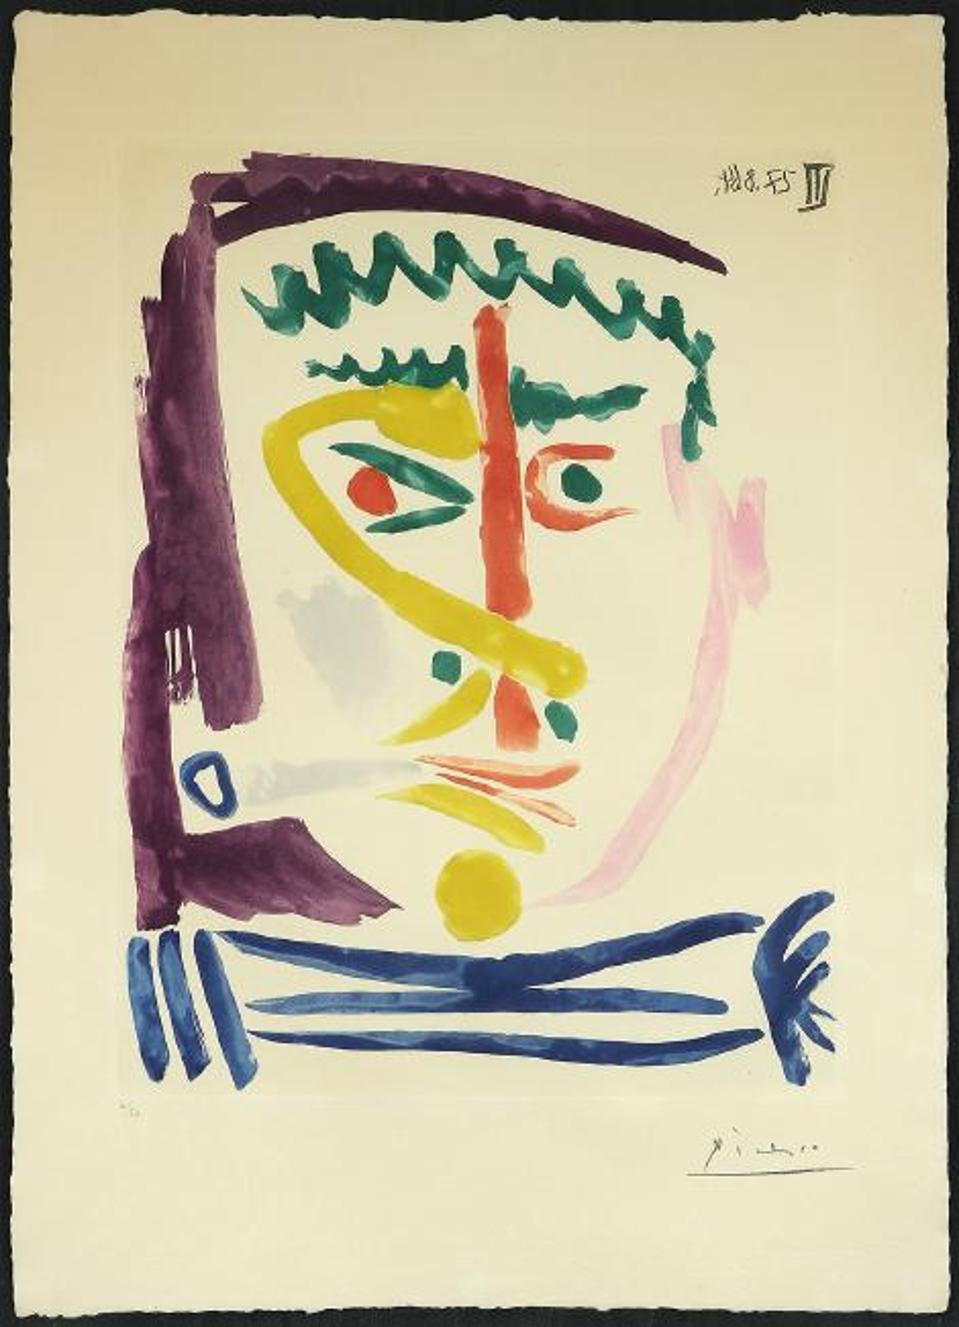 Pablo Picasso, ″Fumeur III″, color aquatint